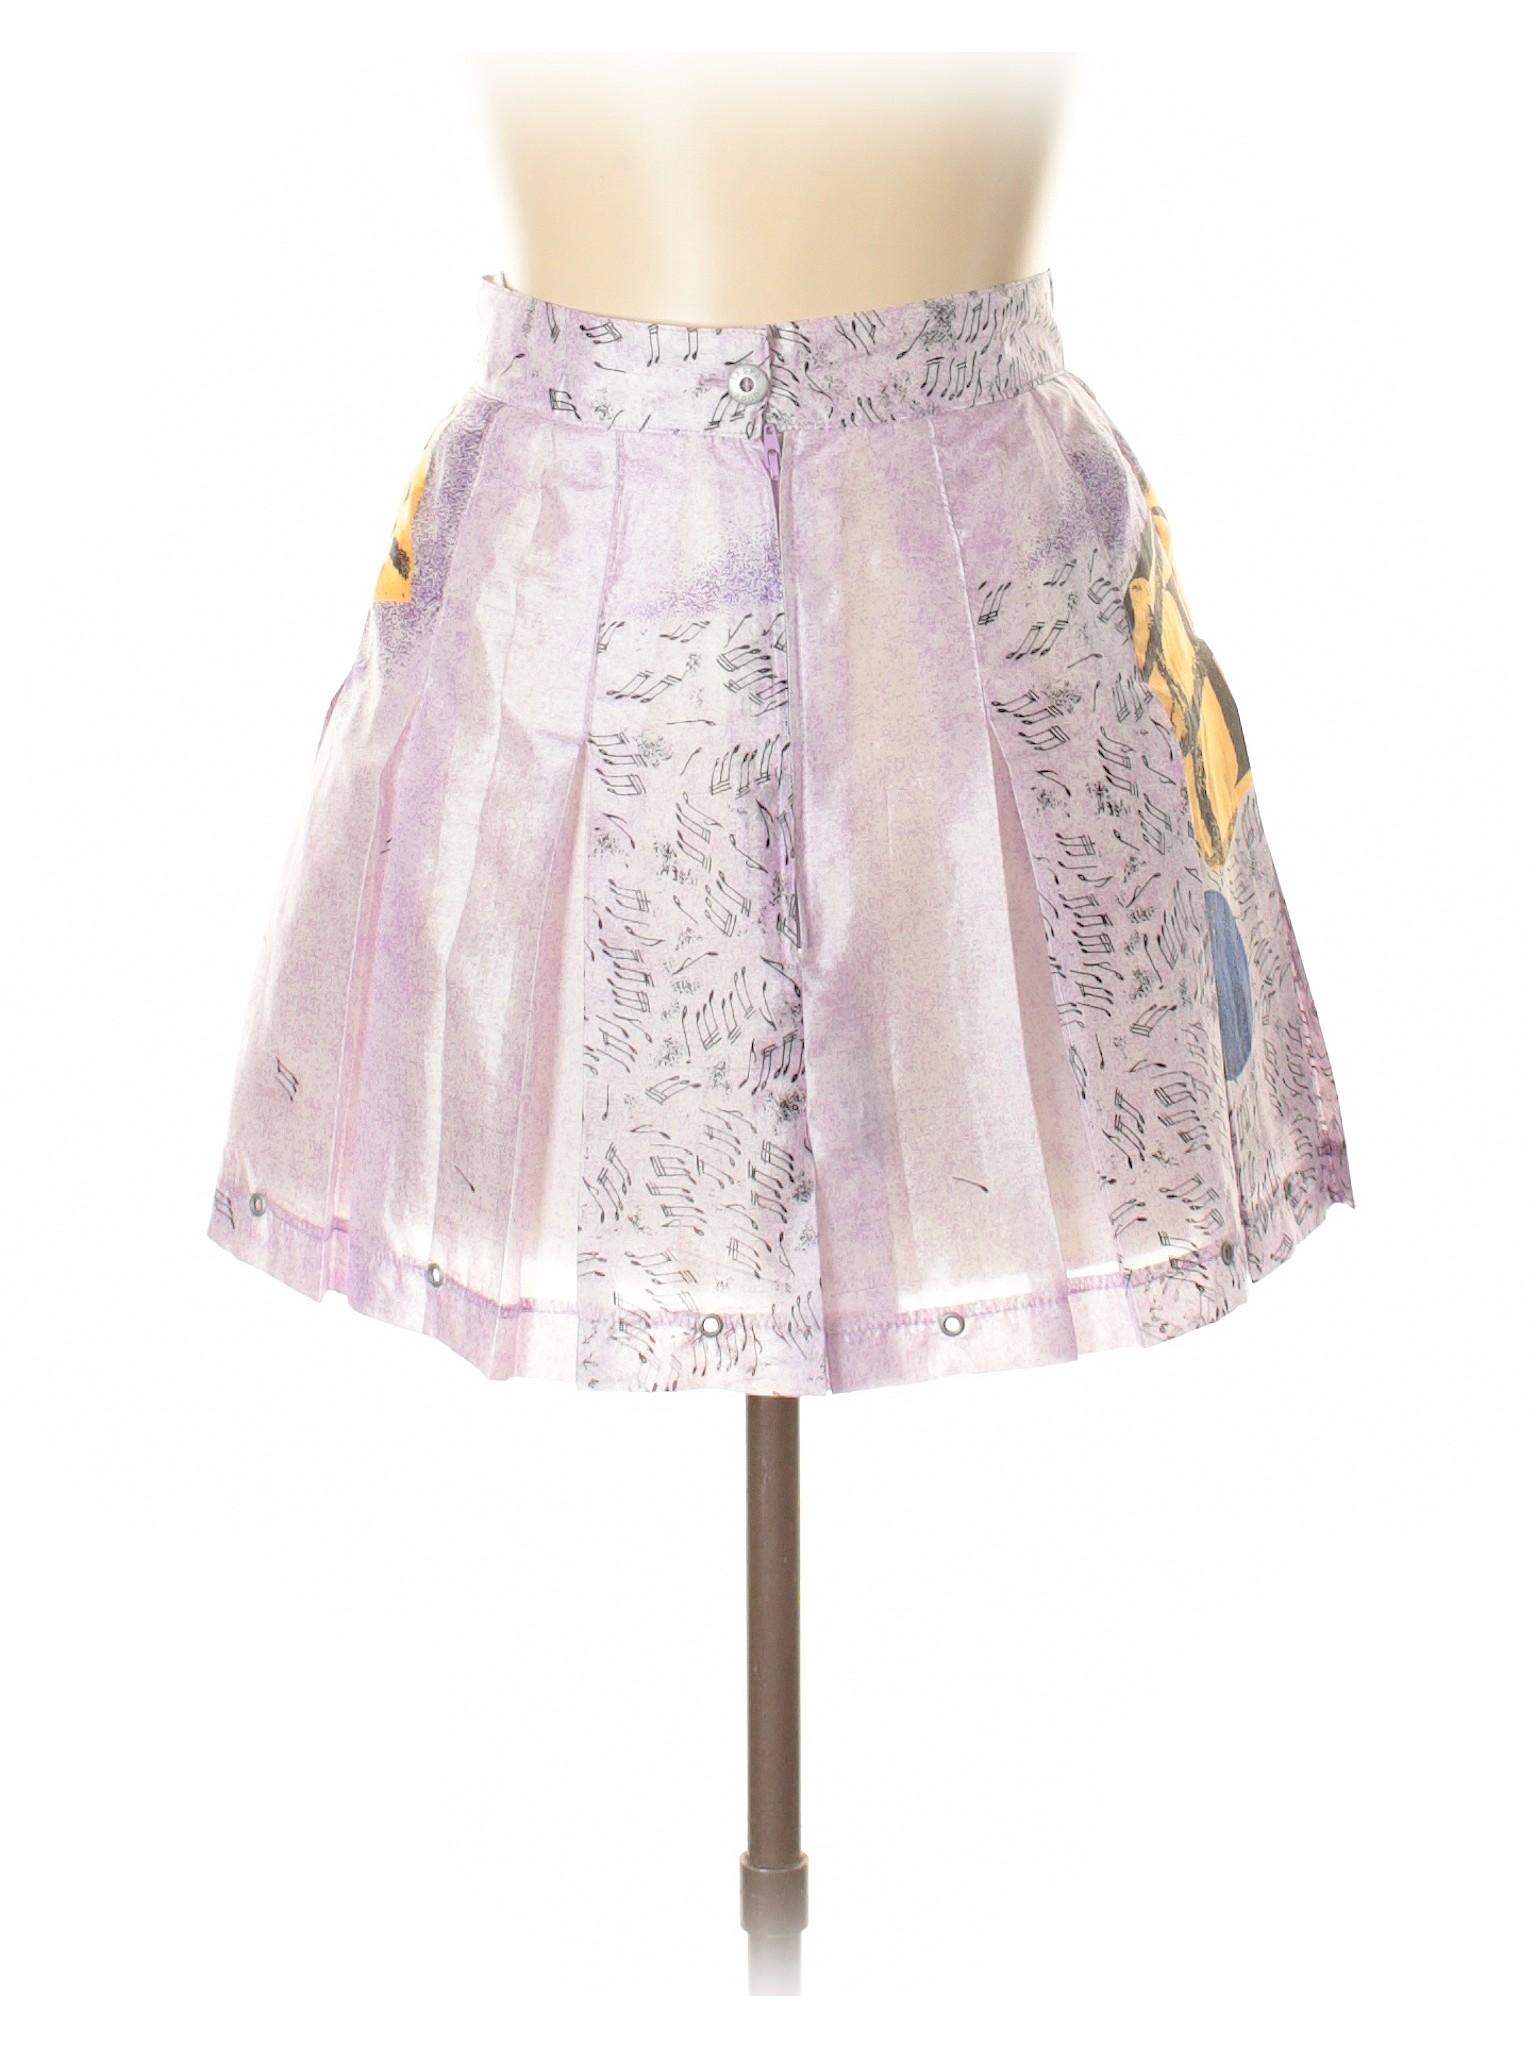 Boutique Skirt Casual Casual Skirt Skirt Boutique Boutique Boutique Casual Ixn748w